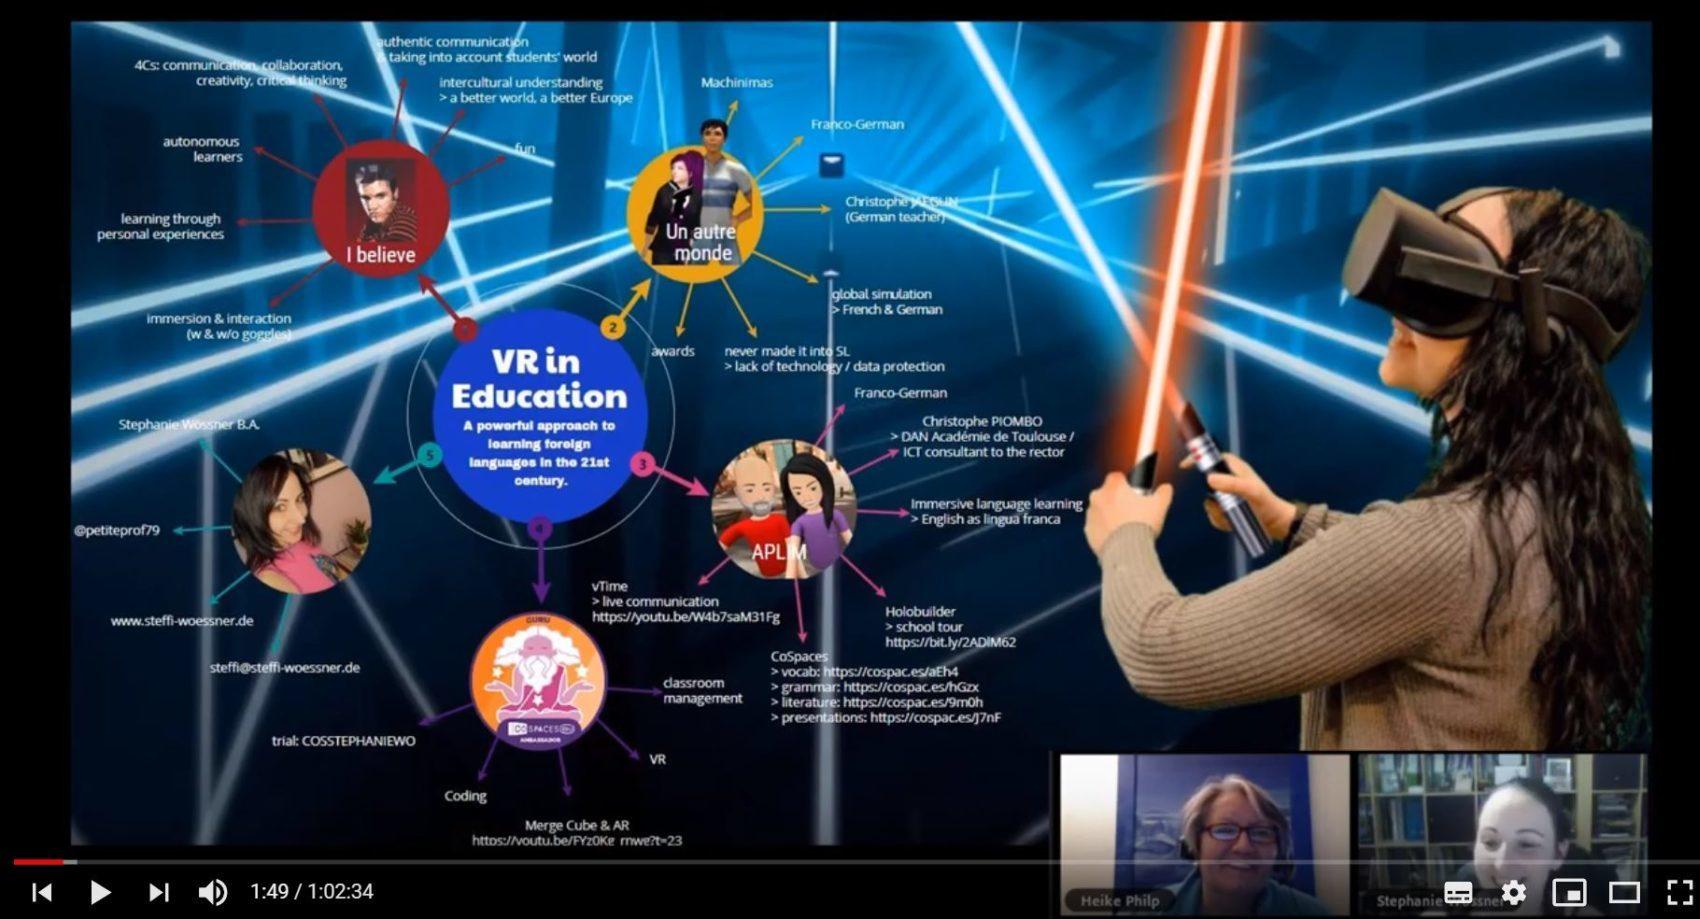 Webinaire: Immersive Language Learning